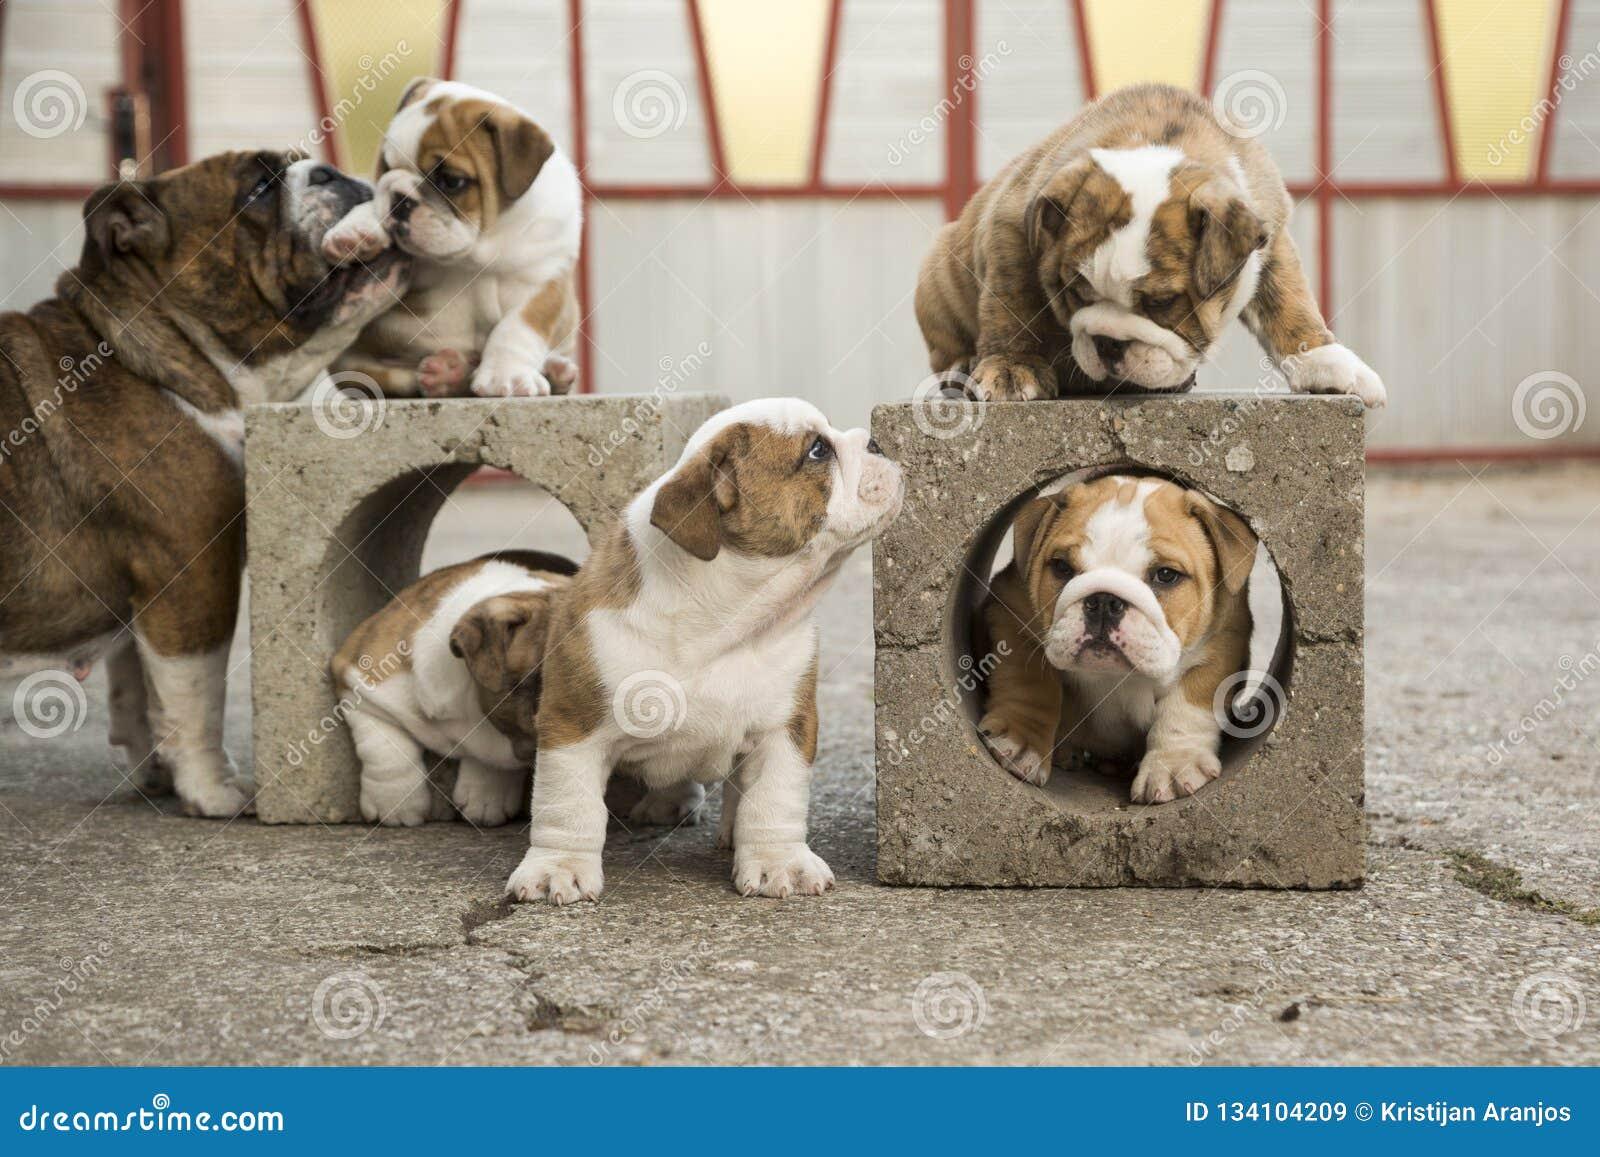 English Bulldog Puppies Backyard Playing Young Dogs Stock Image Image Of Backyard Doggy 134104209